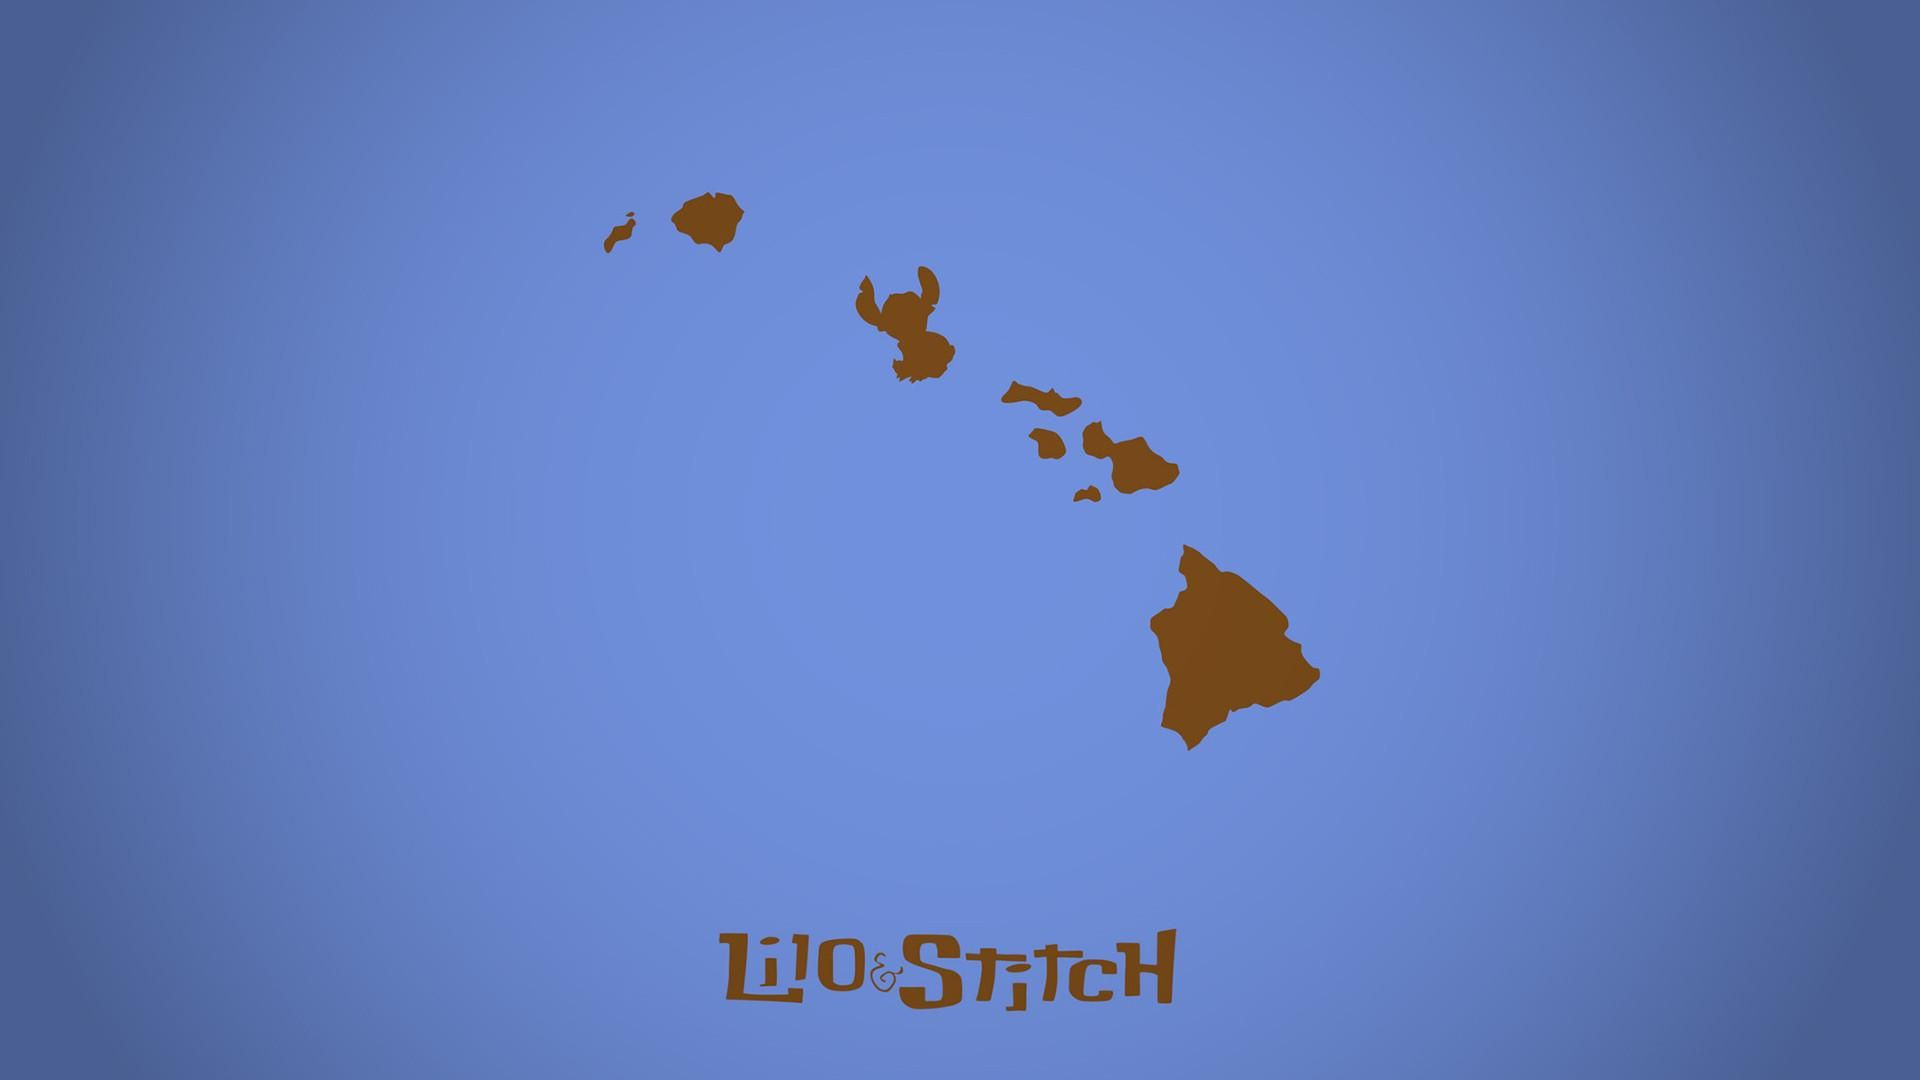 Wallpaper iphone stitch - Stitch Wallpaper Google Search Ohana Pinterest Pontos